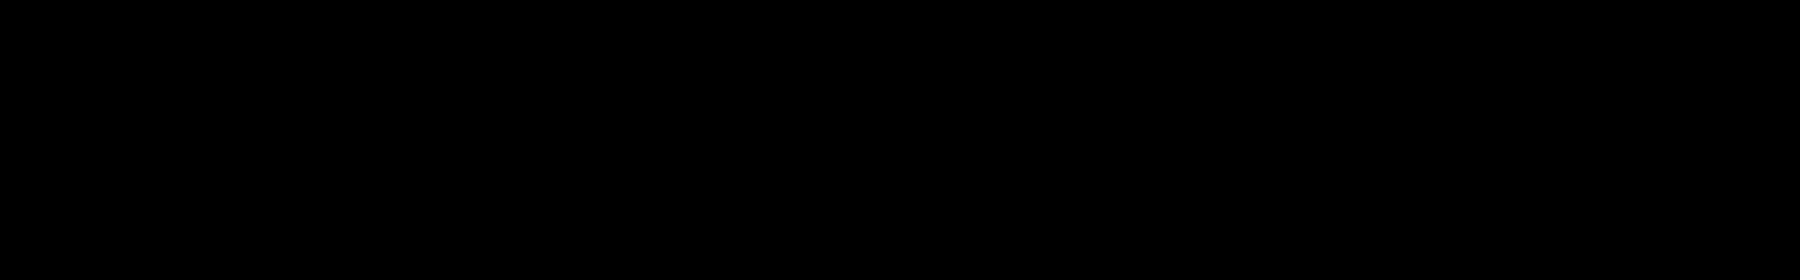 Glitch Step Tek audio waveform